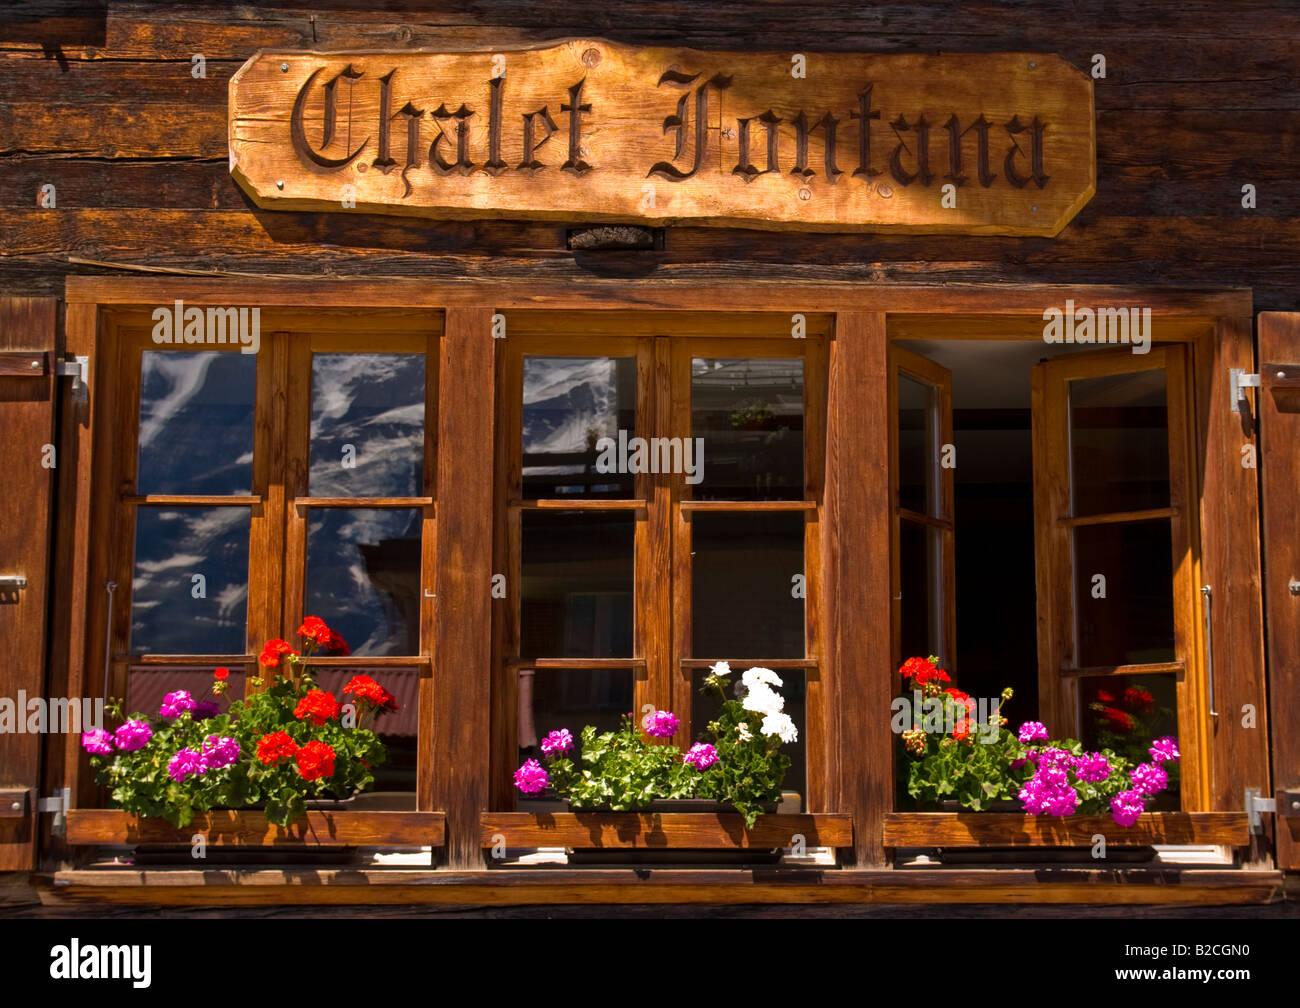 Typical chalet, Murren, Switzerland - Stock Image